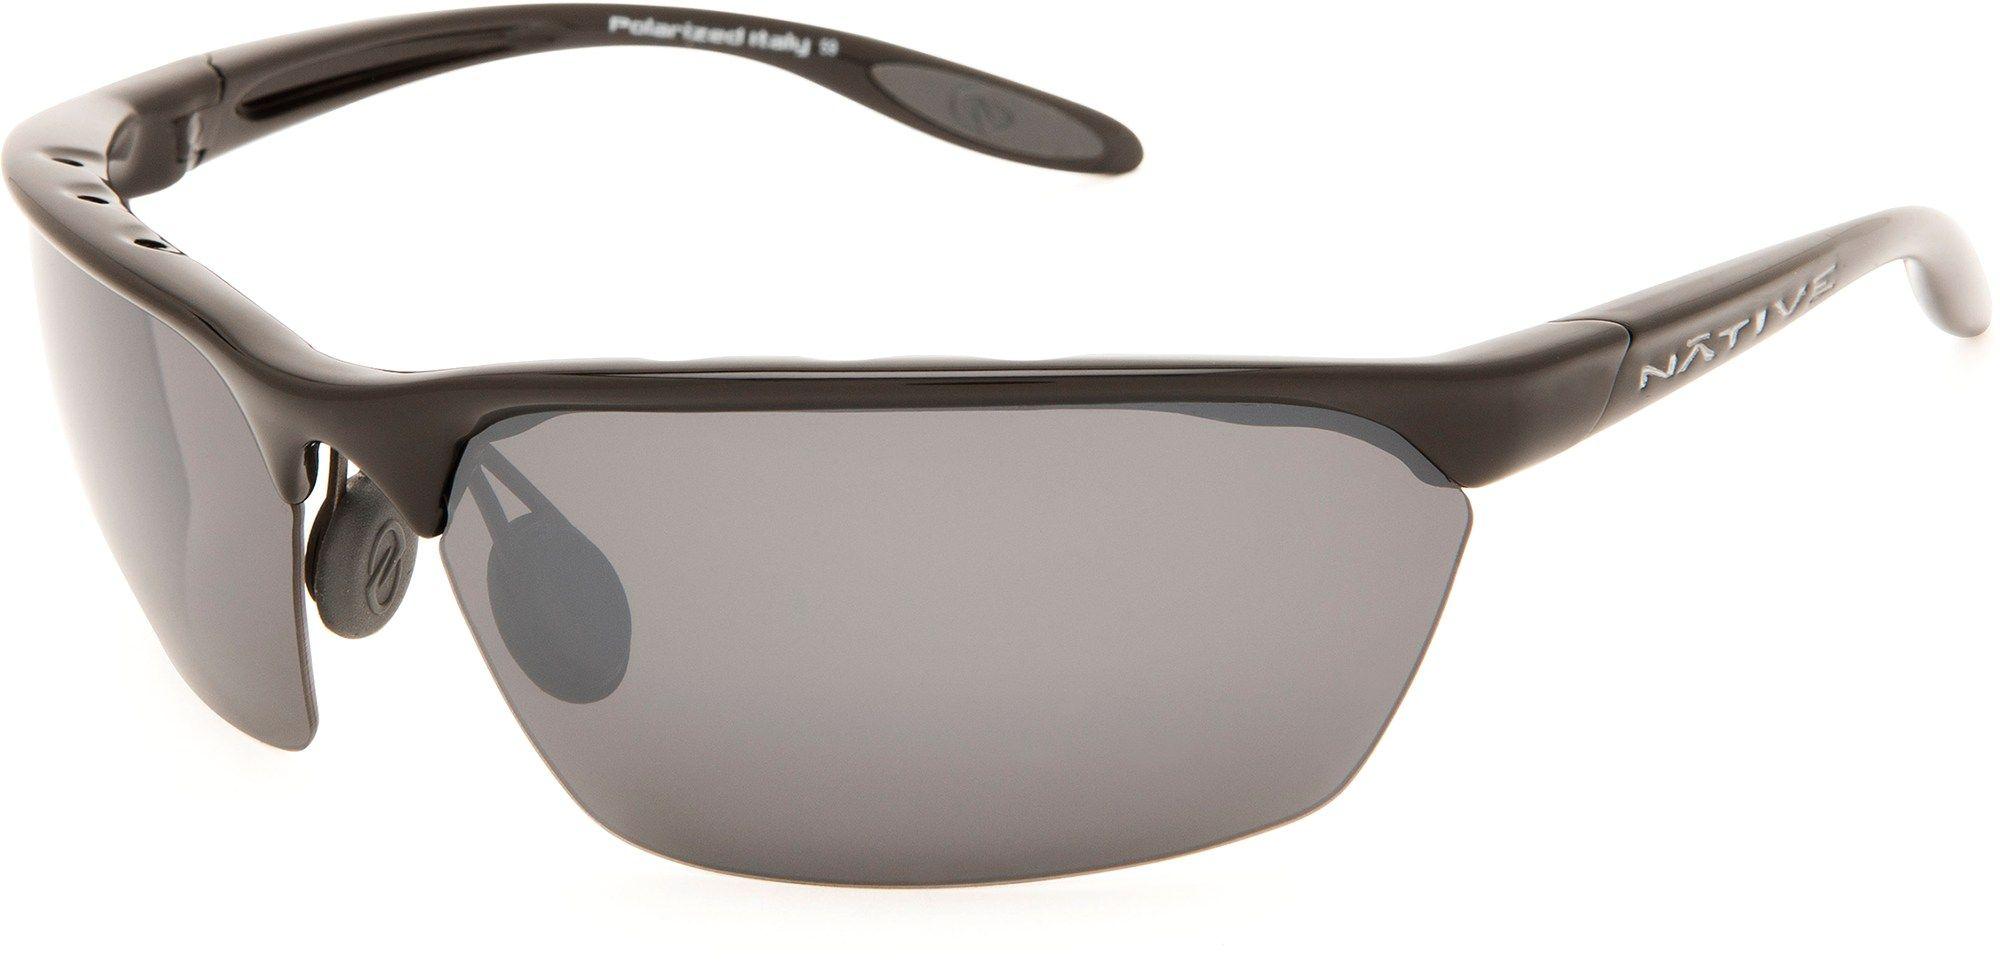 7148ffc19e Native Eyewear Unisex Sprint Reflex Polarized Sunglasses